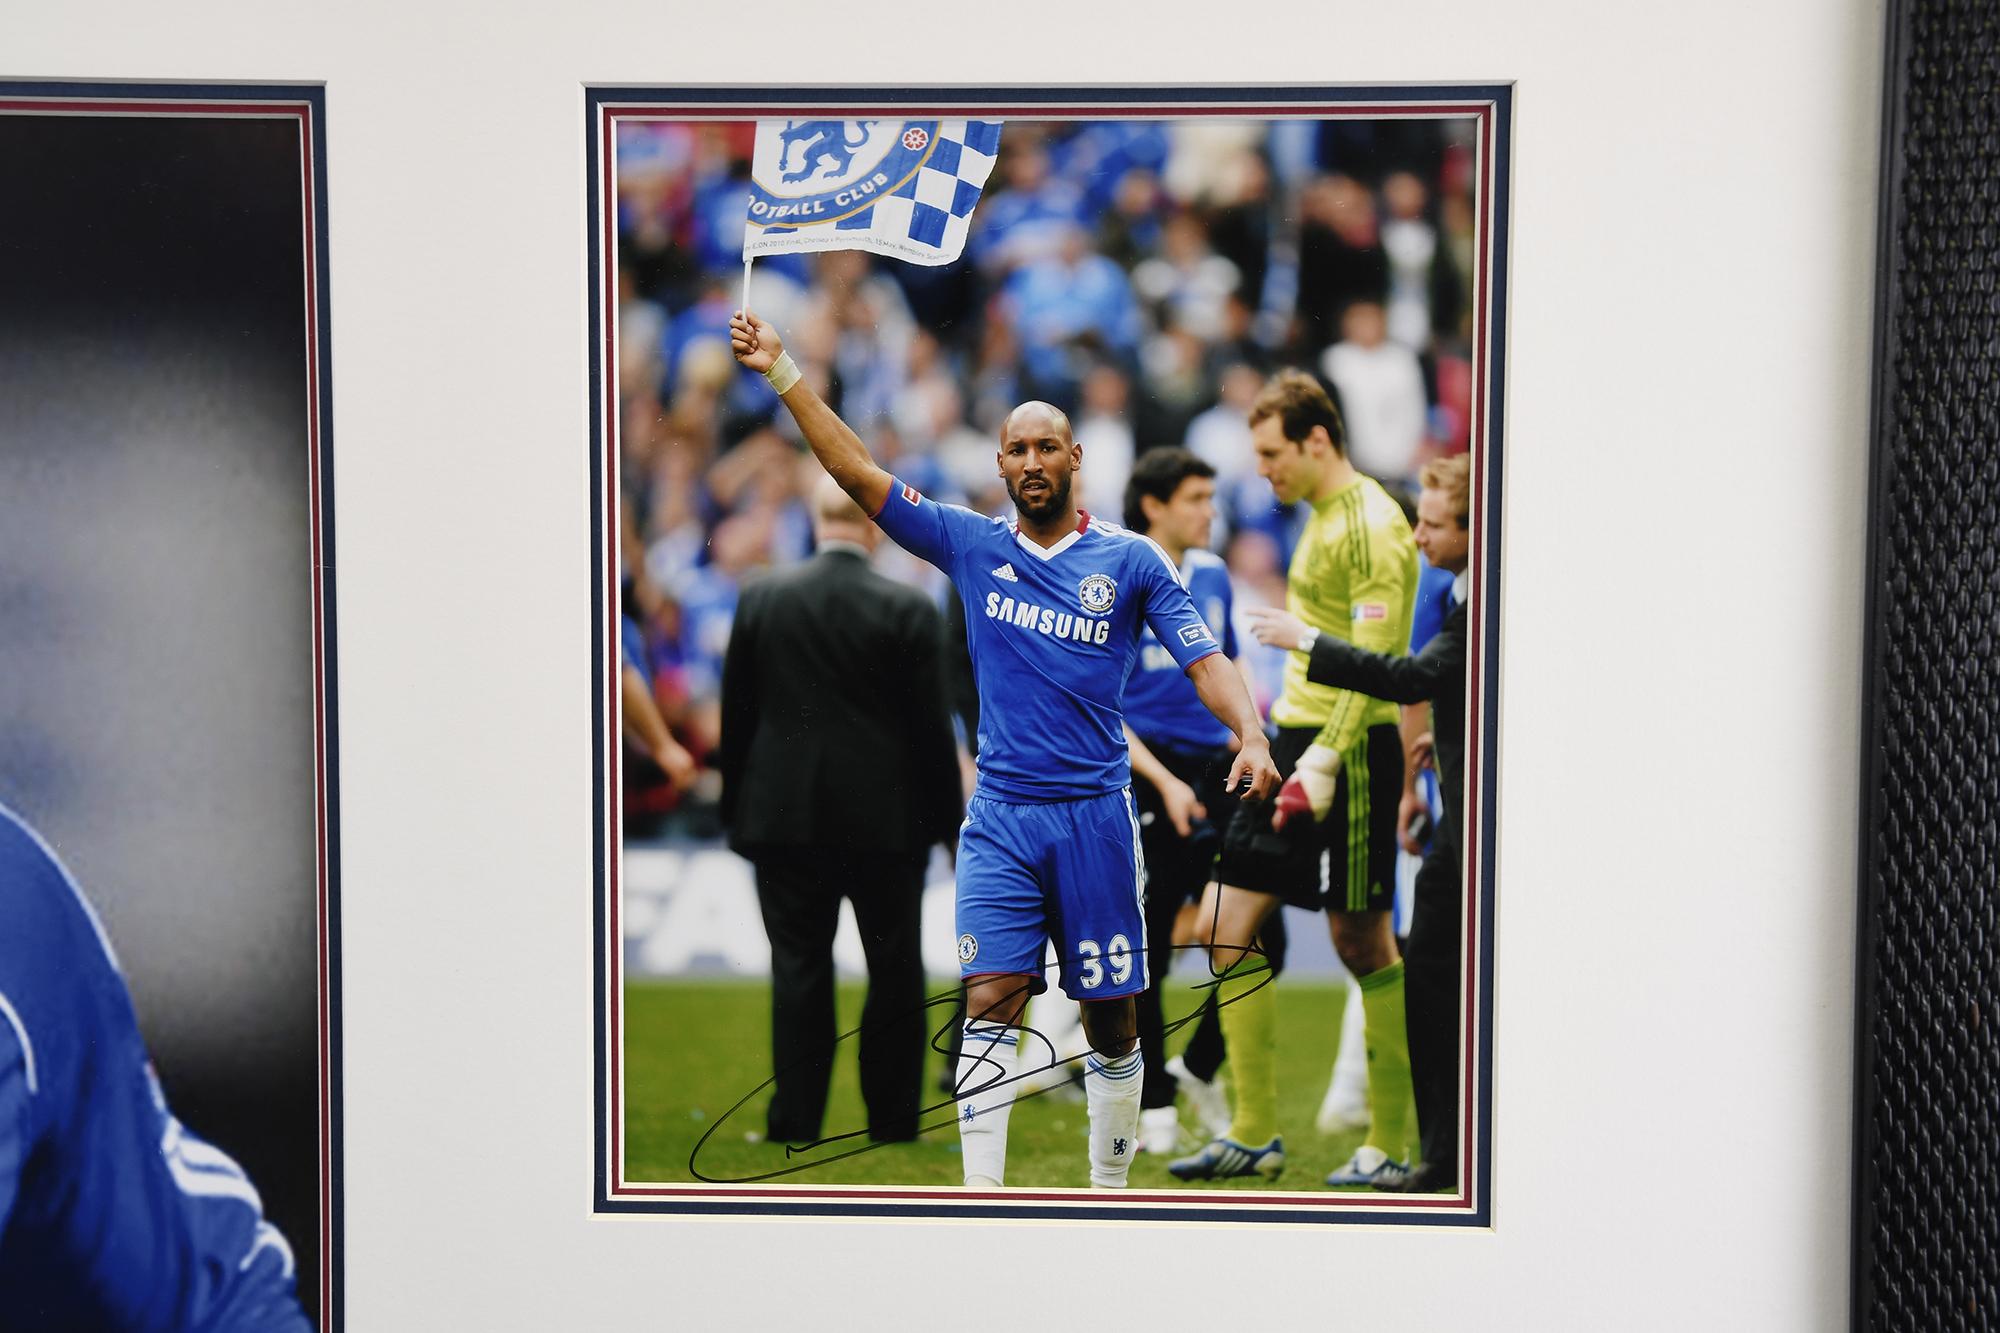 Framed Presentation of Chelsea Footballer Nicolas Anelka. - Image 3 of 4